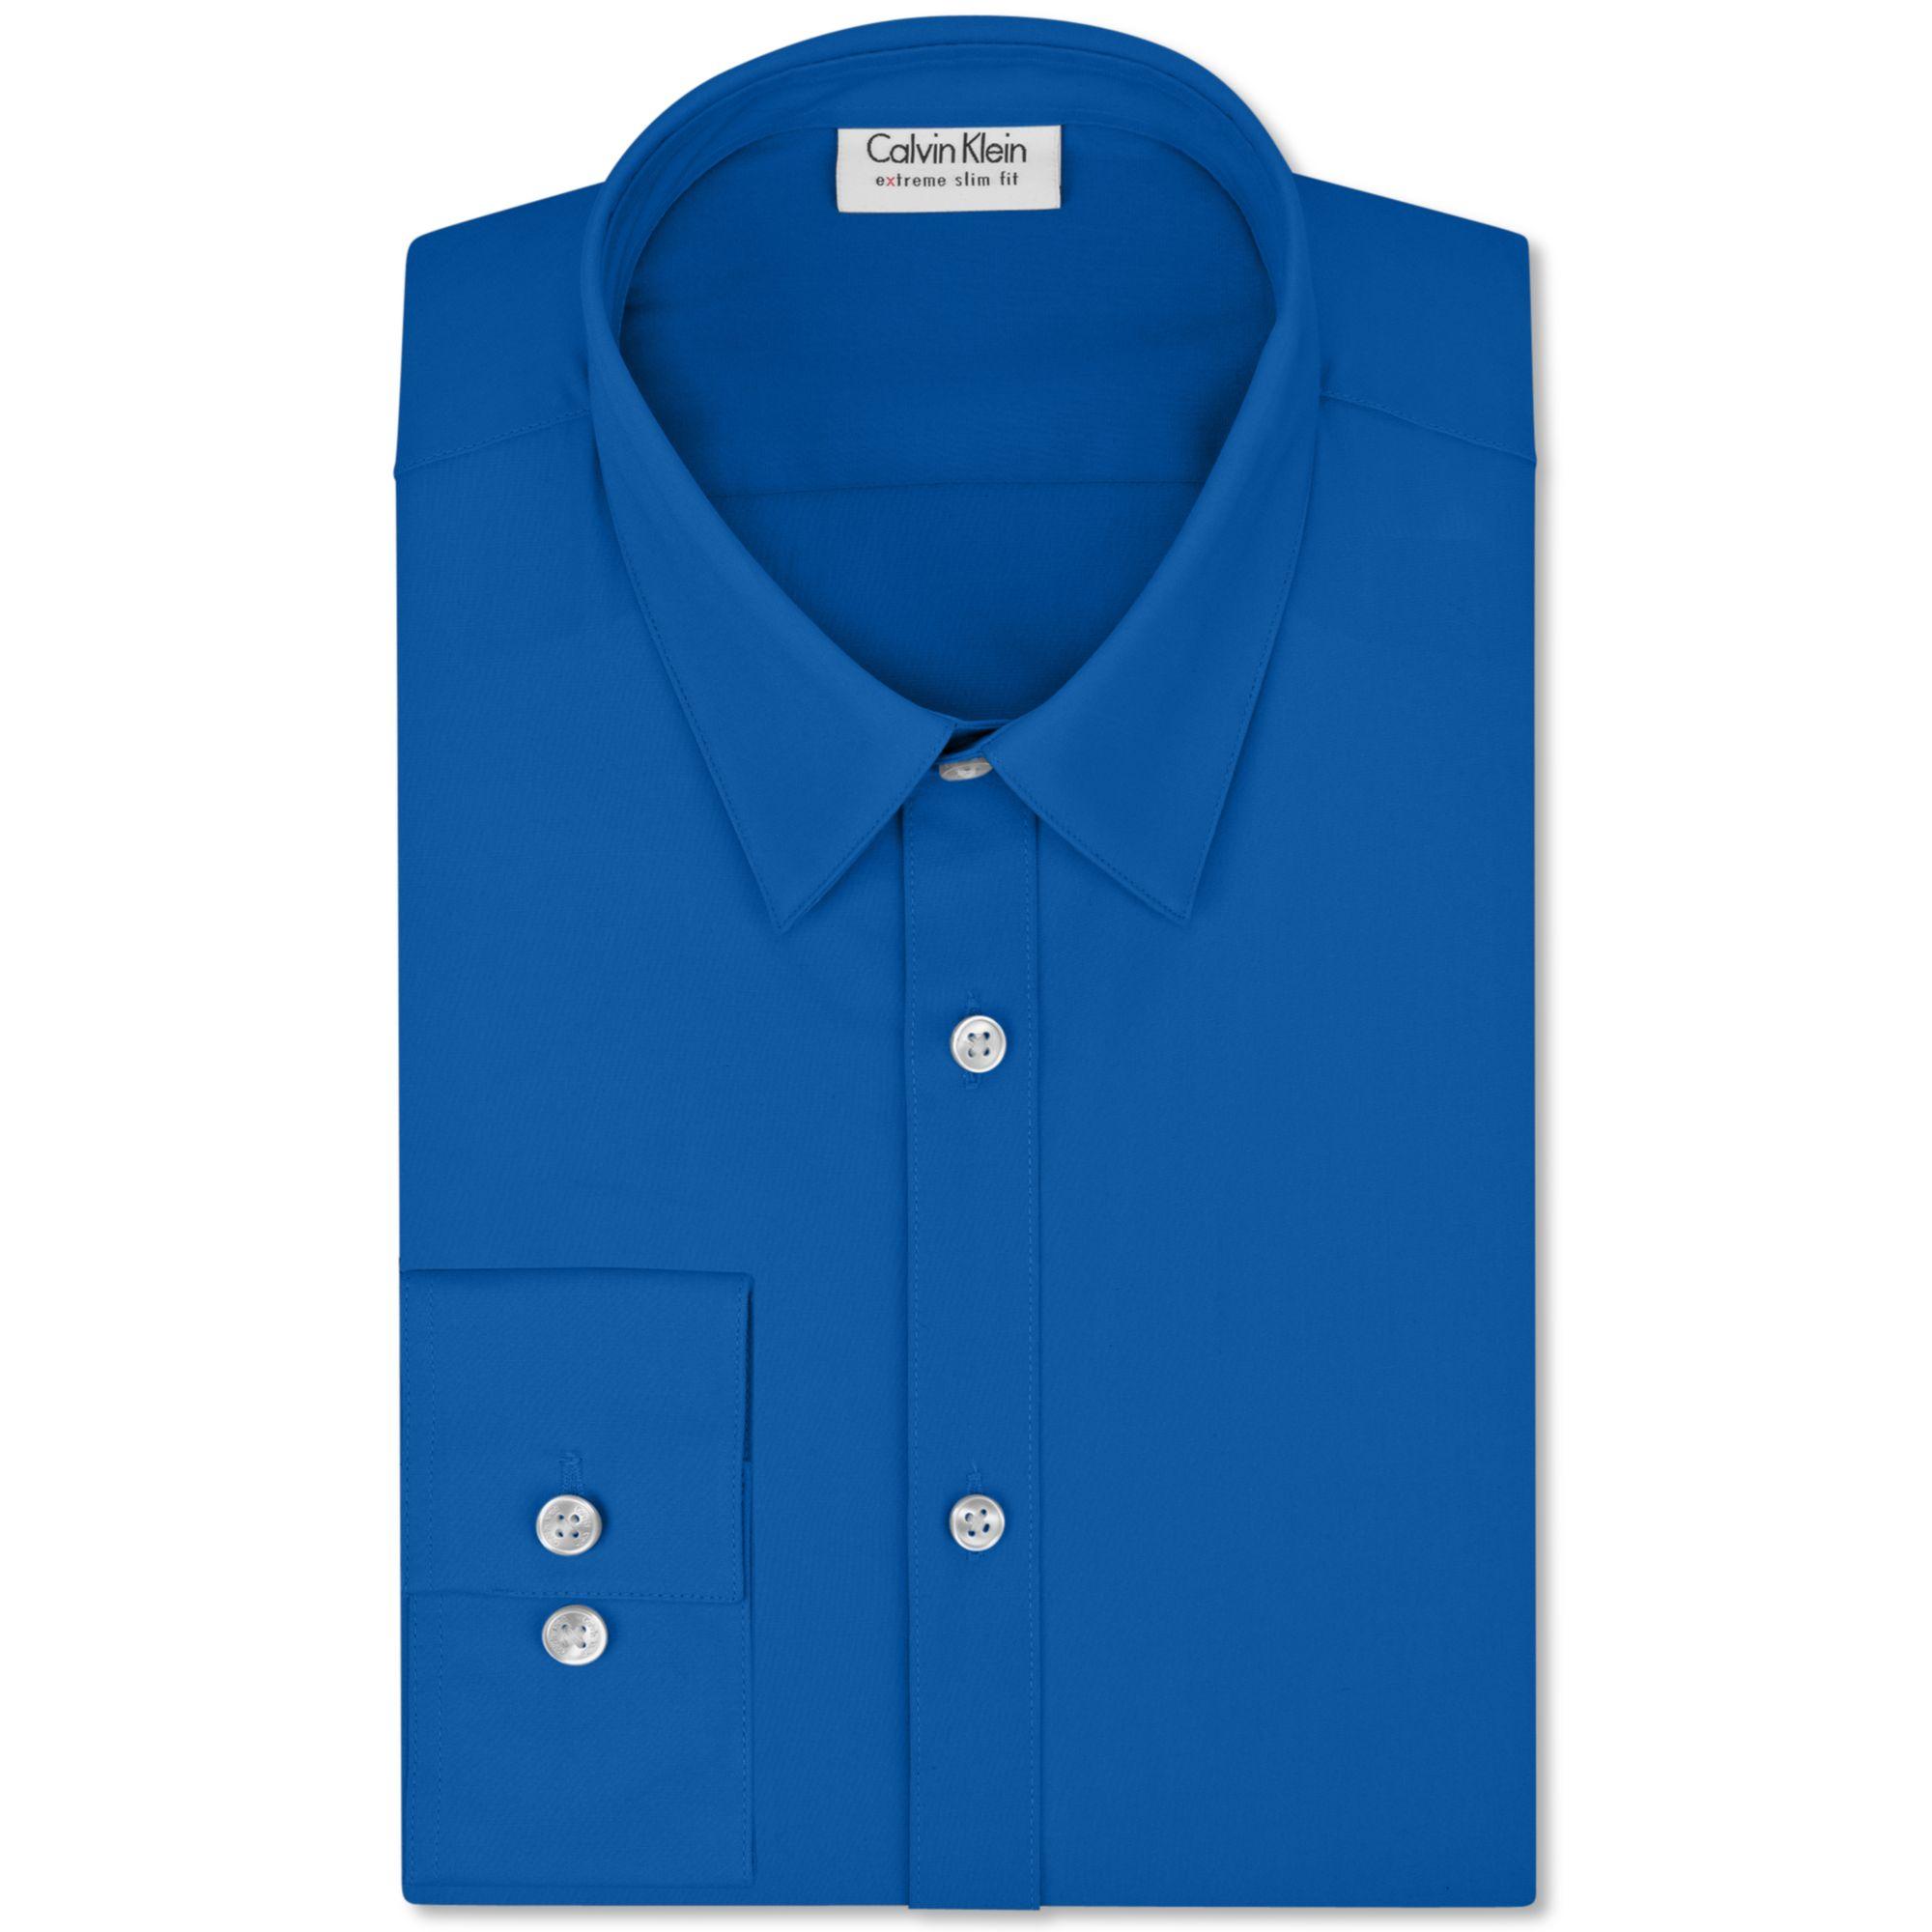 Calvin klein x extra slim fit solid dress shirt in blue for Extra slim dress shirt